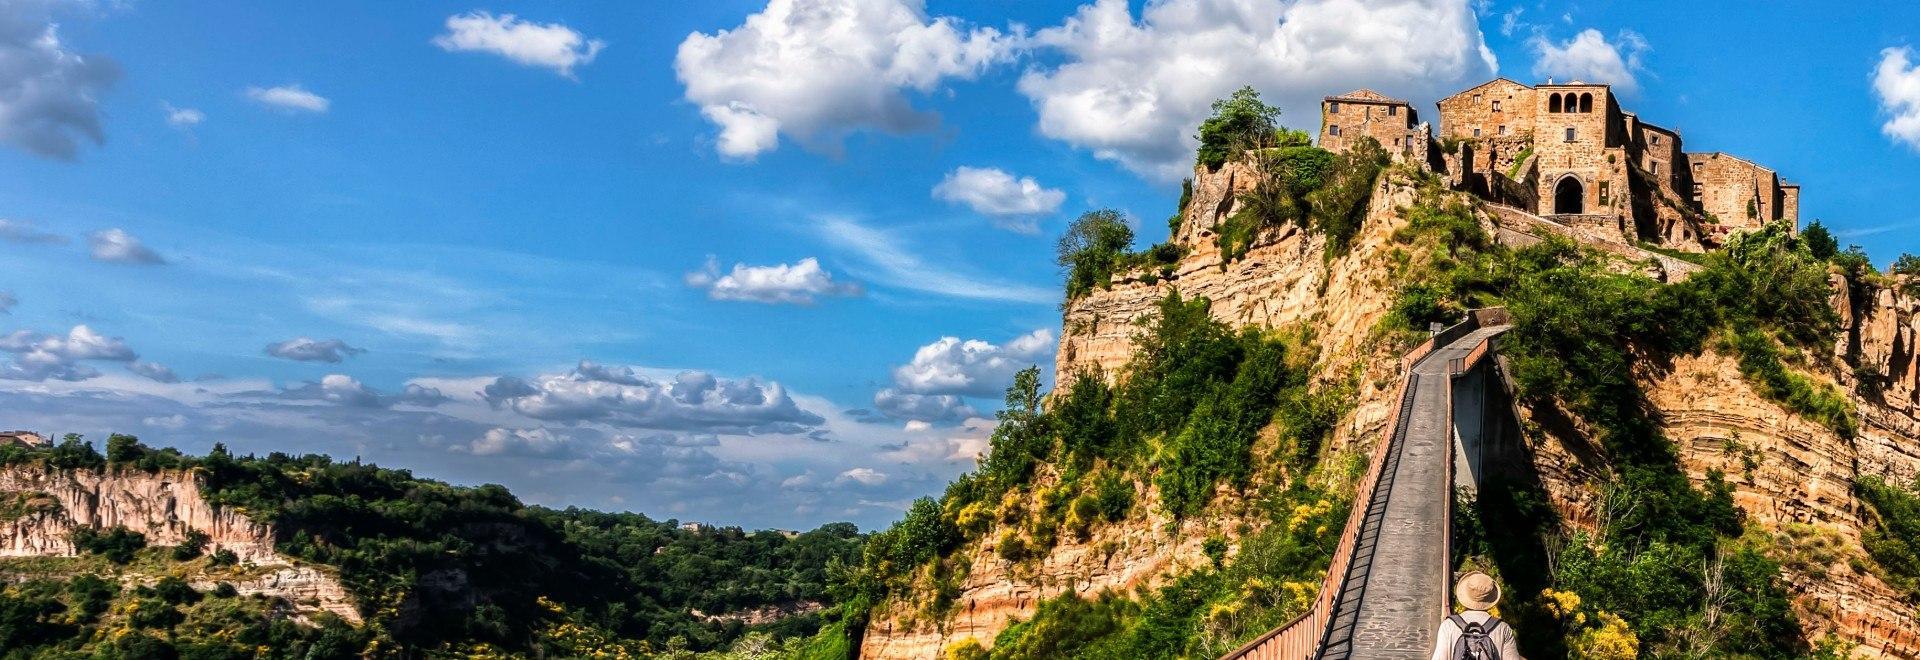 Sicilia: suite d'autore